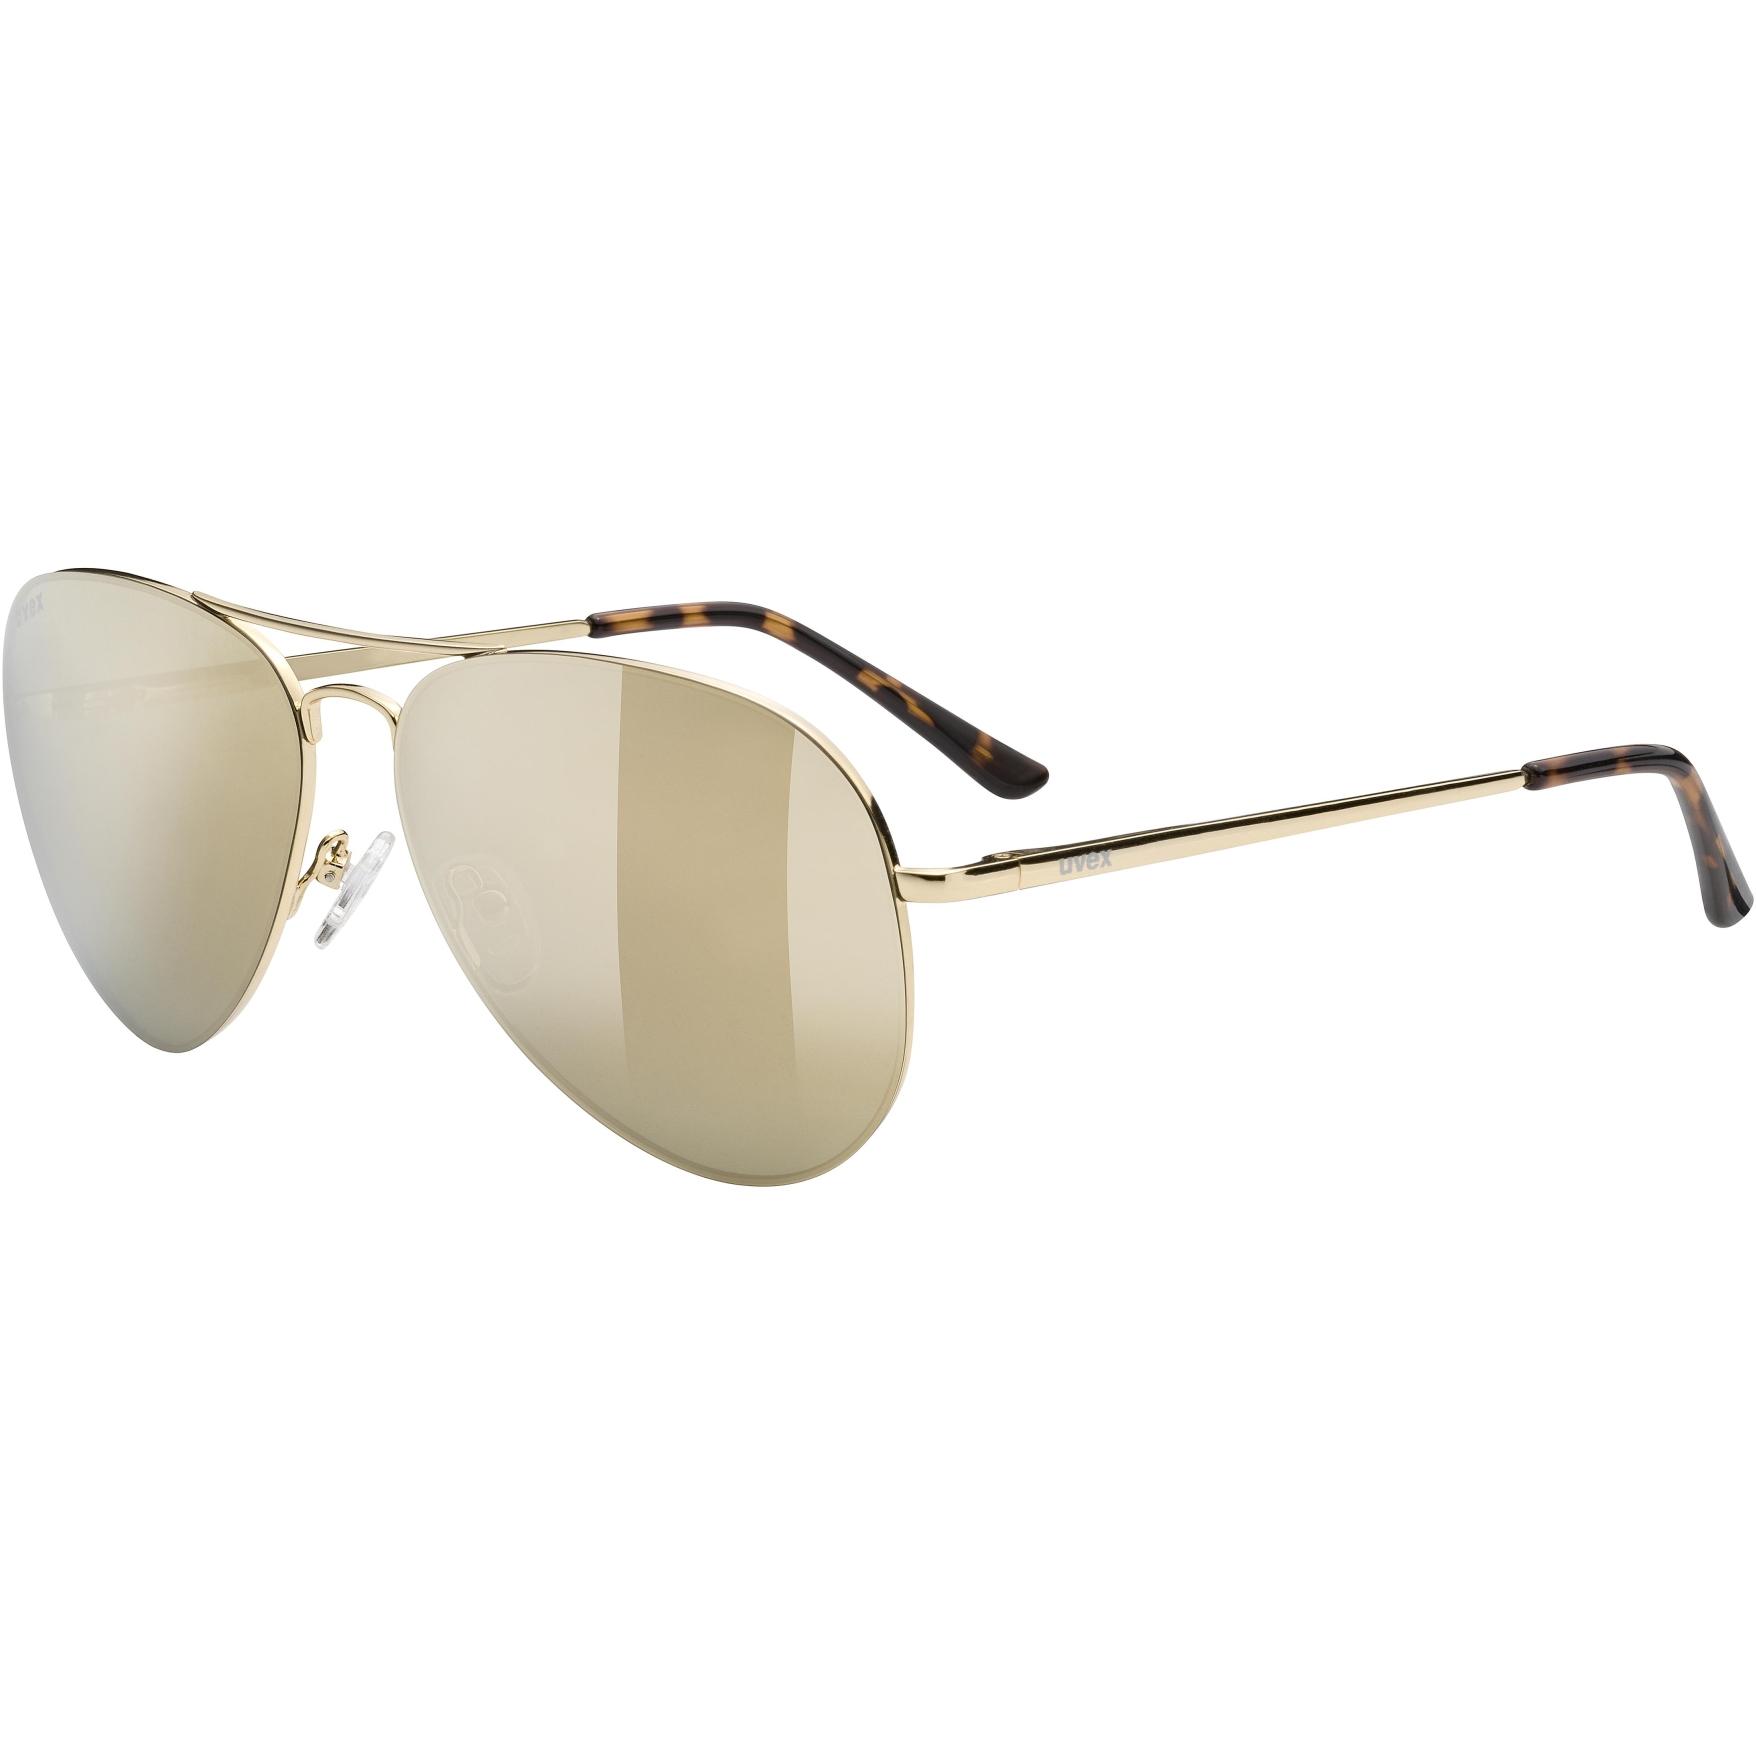 Uvex lgl 45 Glasses - gold/miror gold